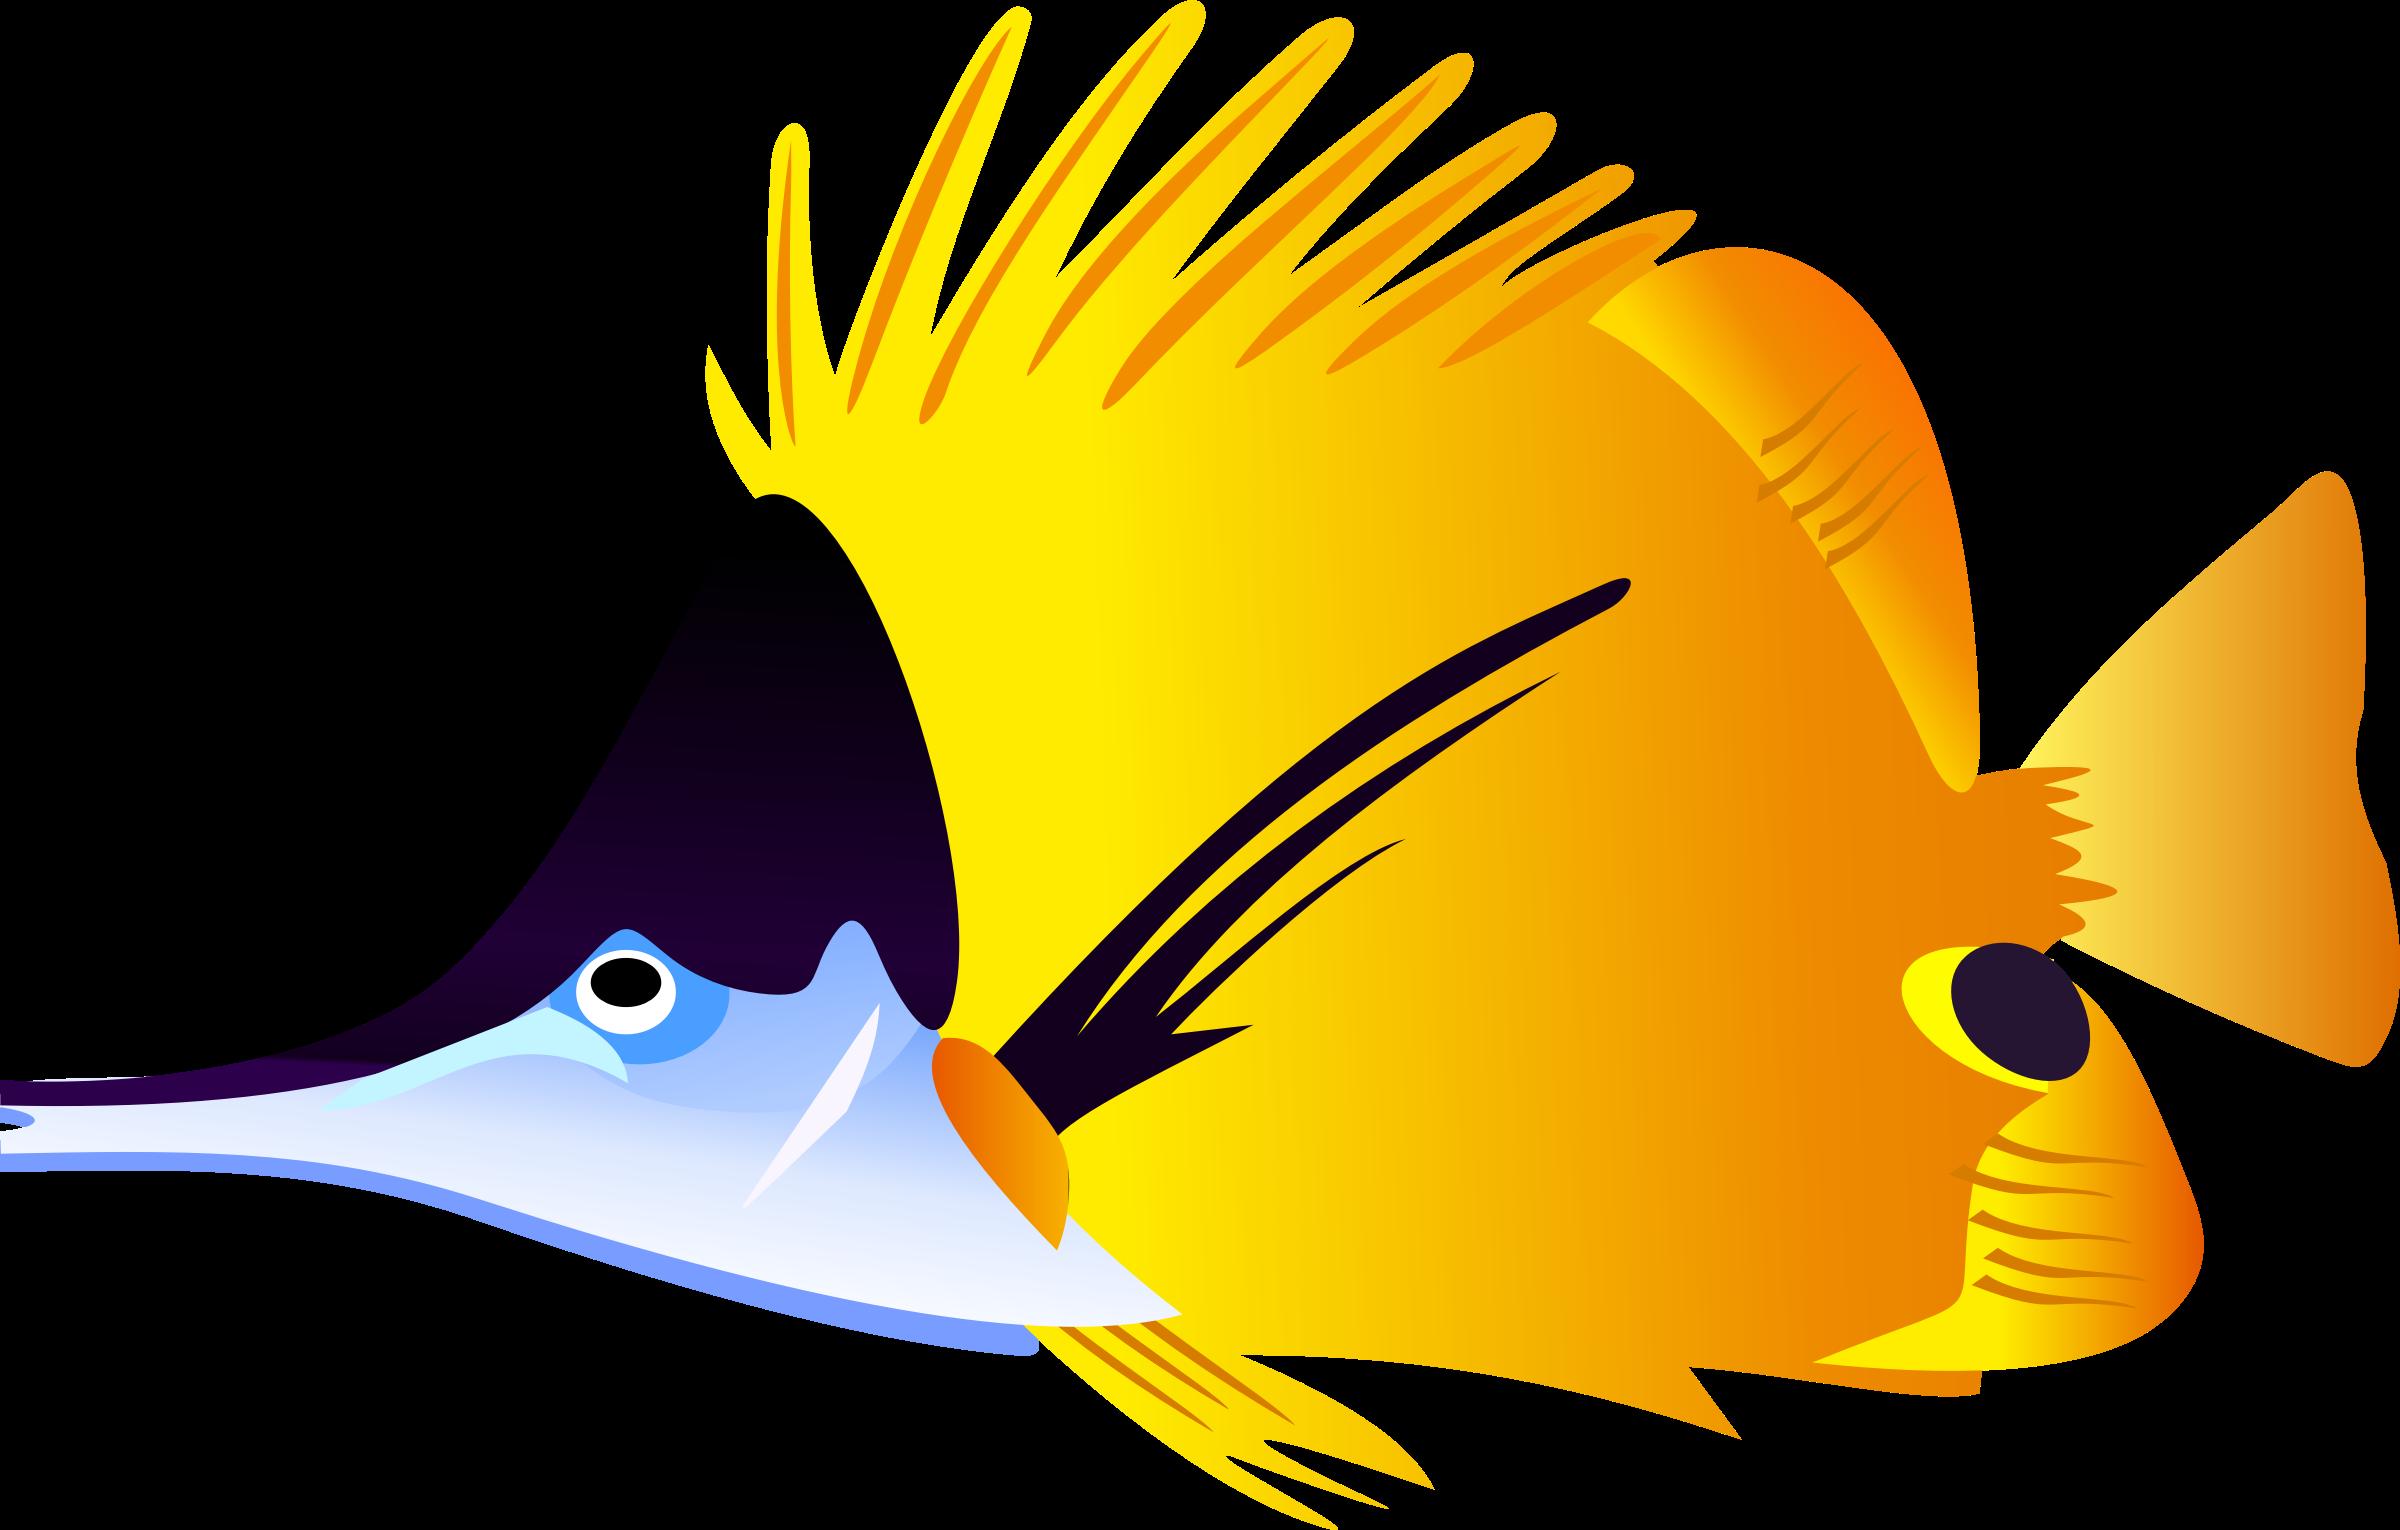 Saltwater Fish Clipart at GetDrawings.com.